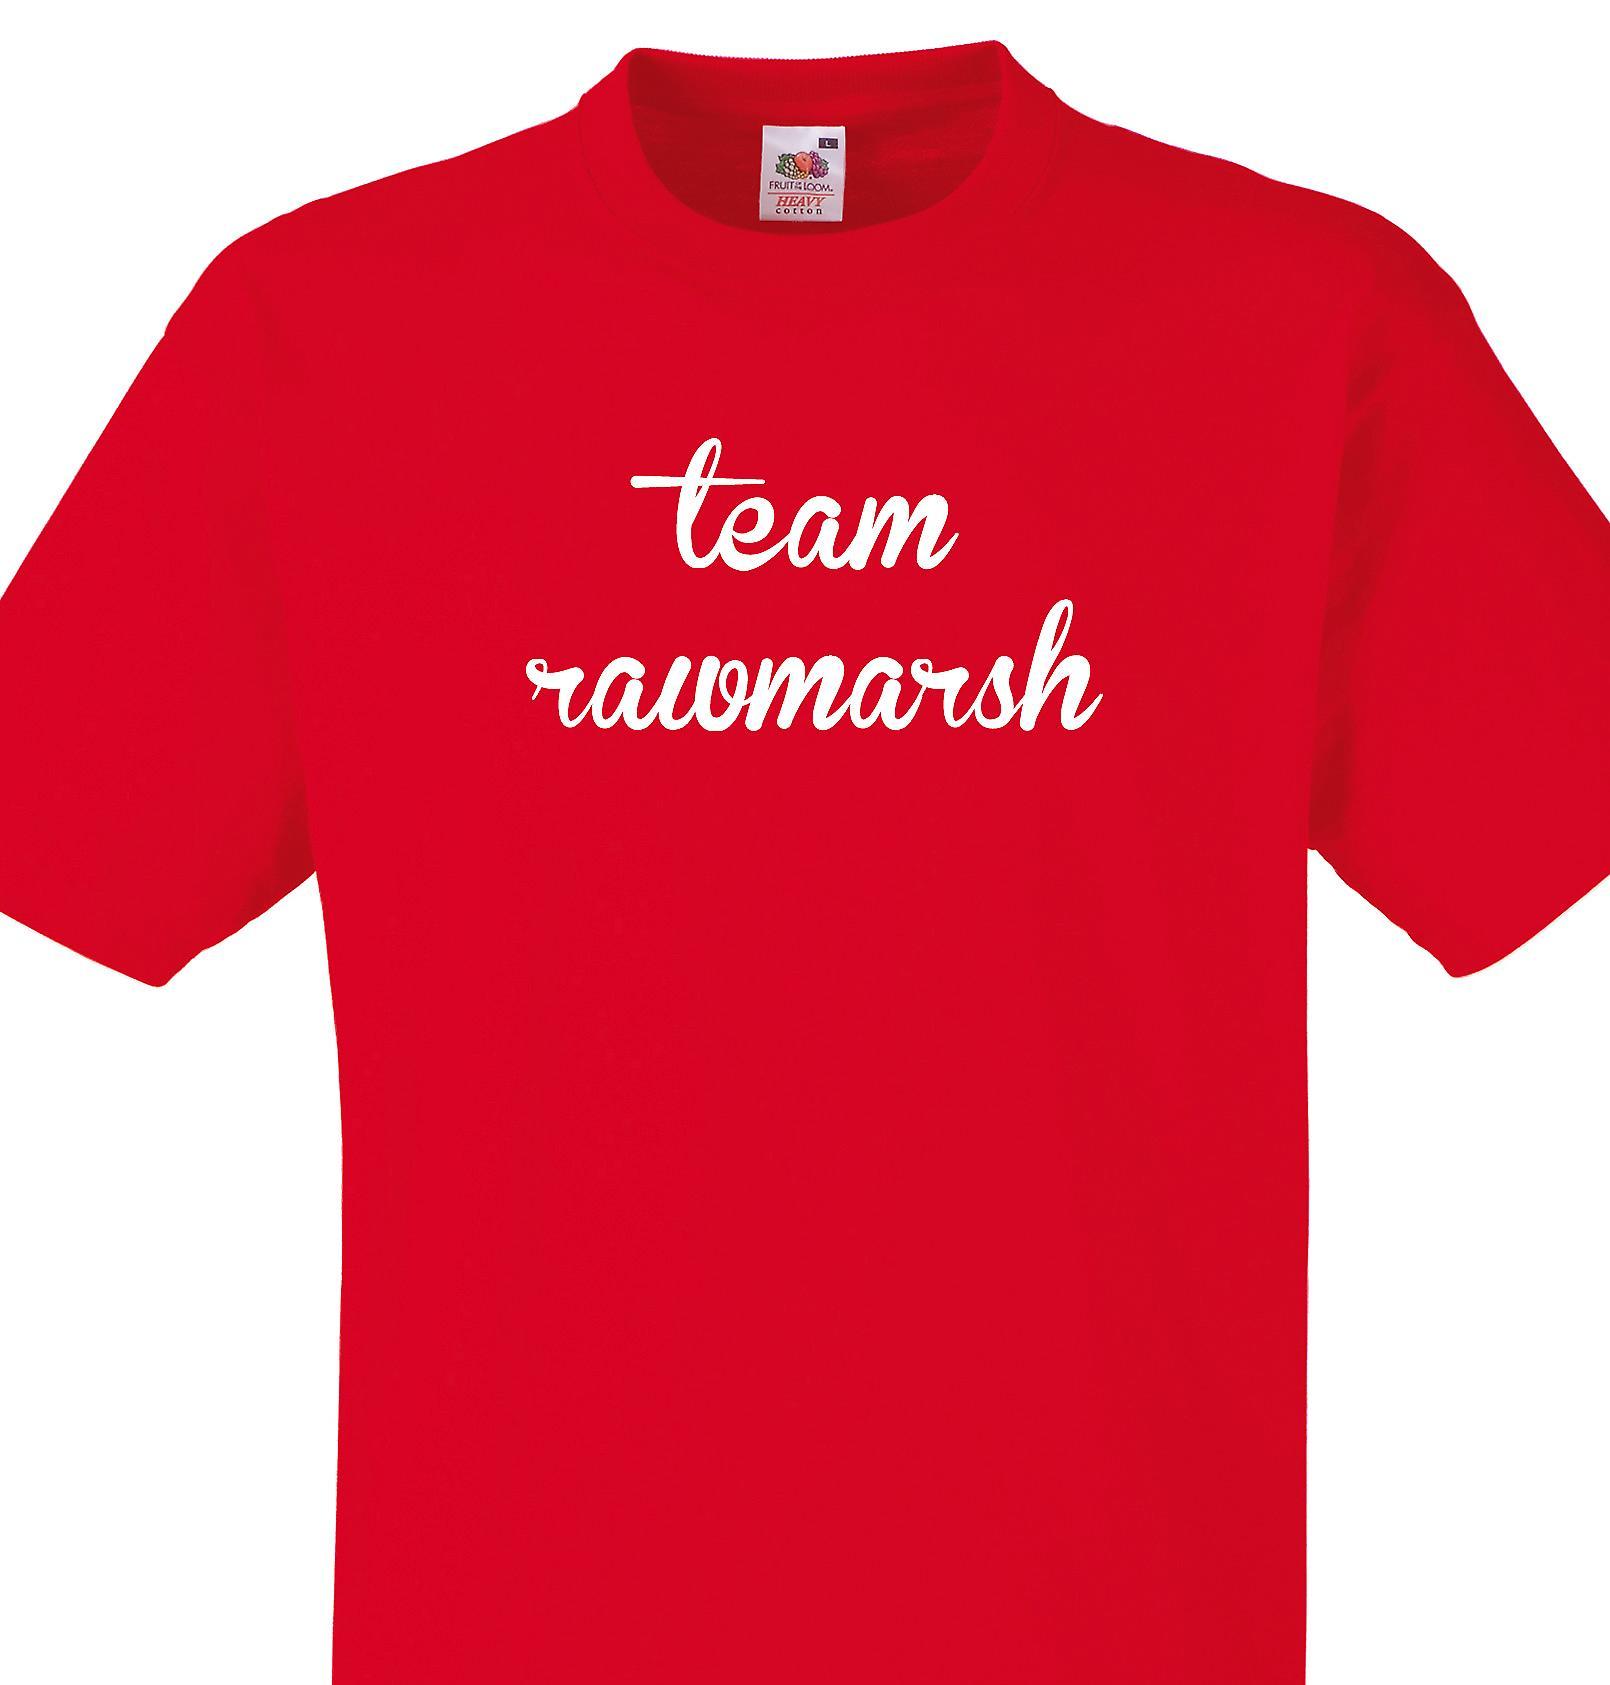 Team Rawmarsh Red T shirt